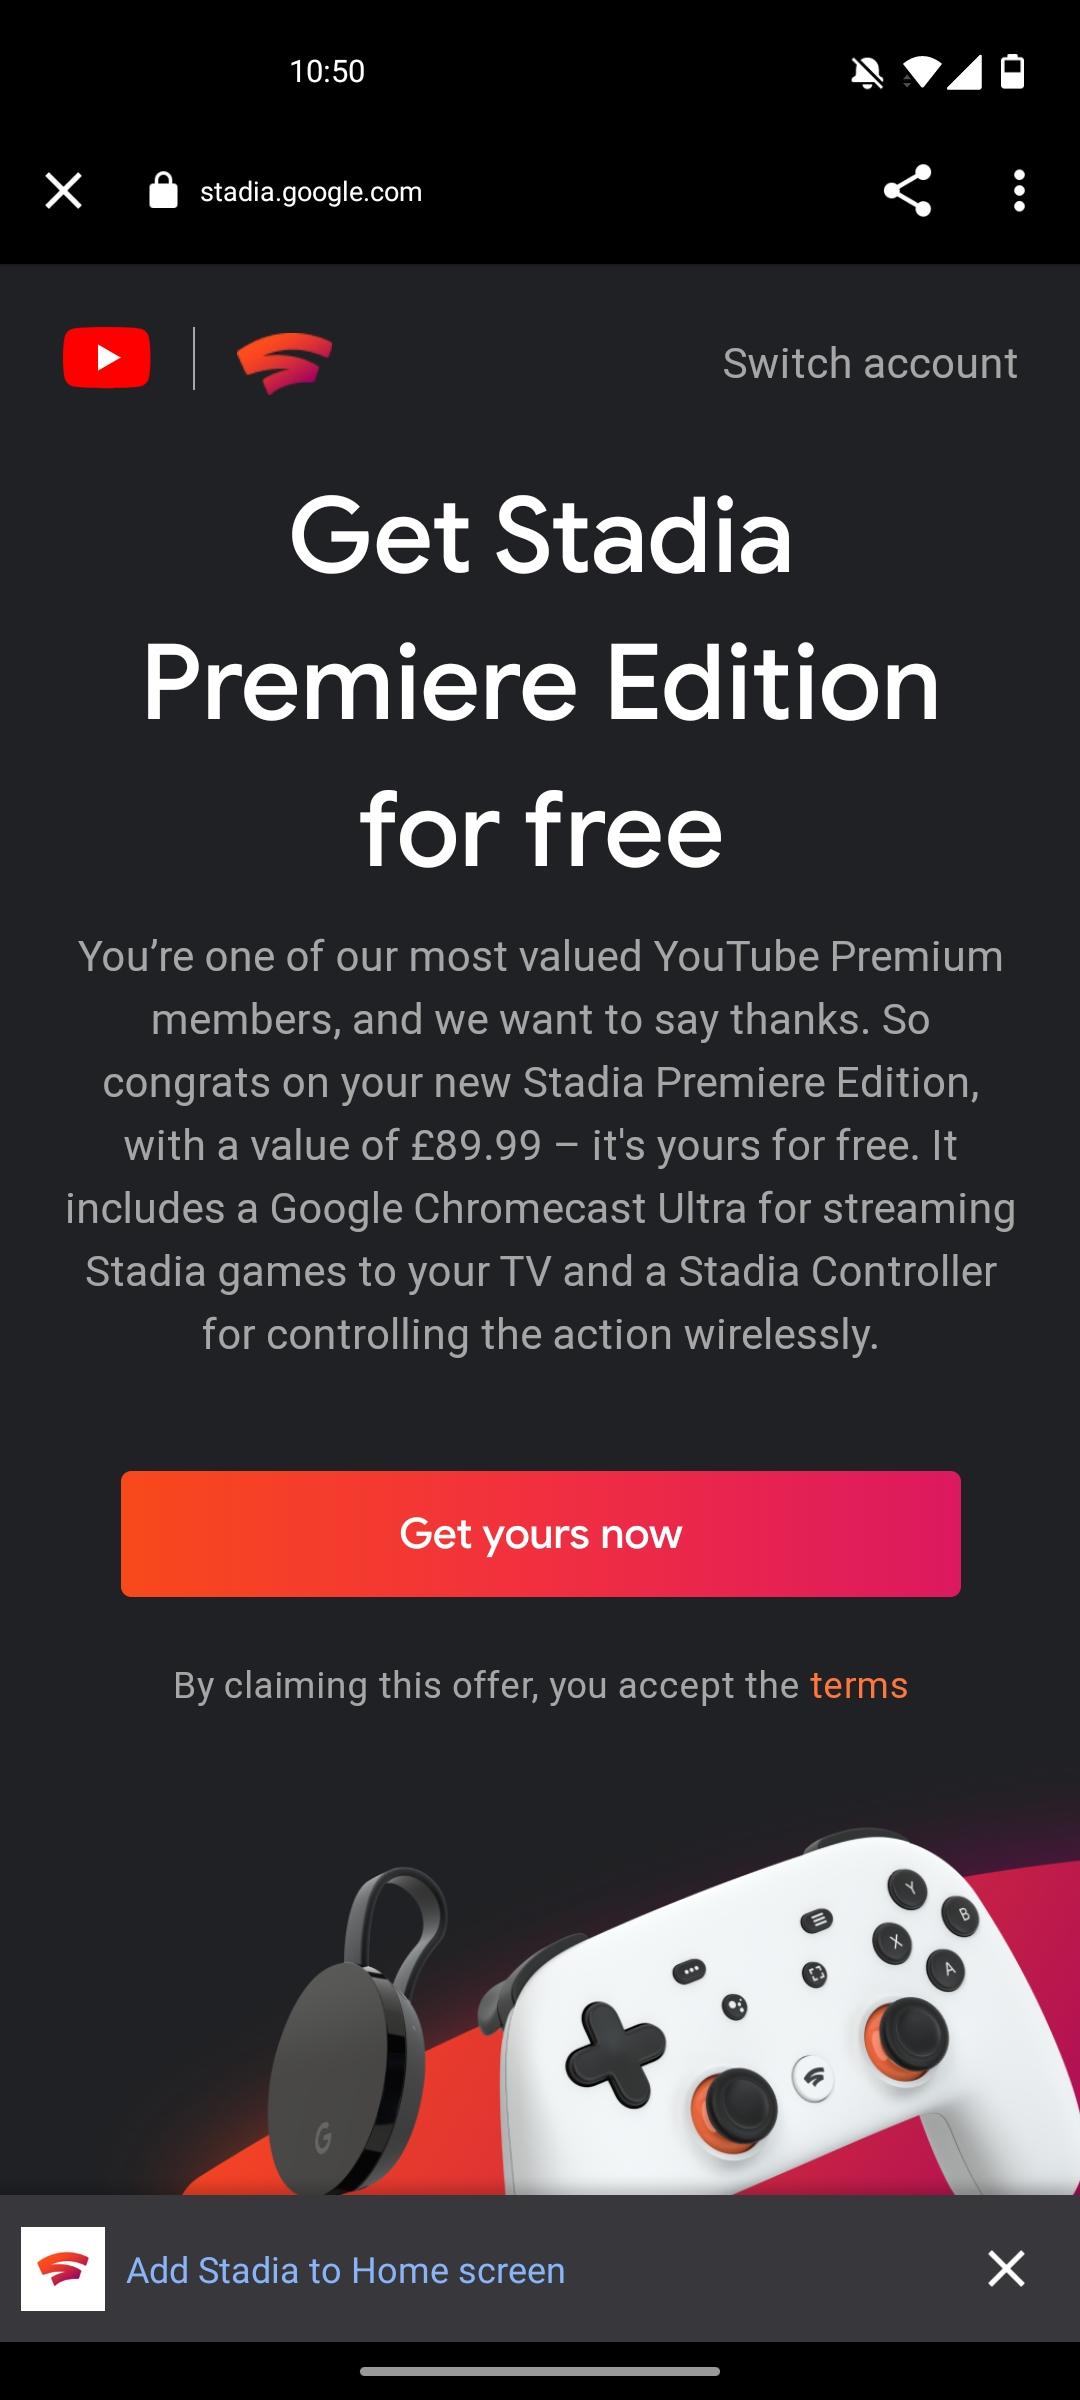 youtube-premium-stadia-premiere-edition-